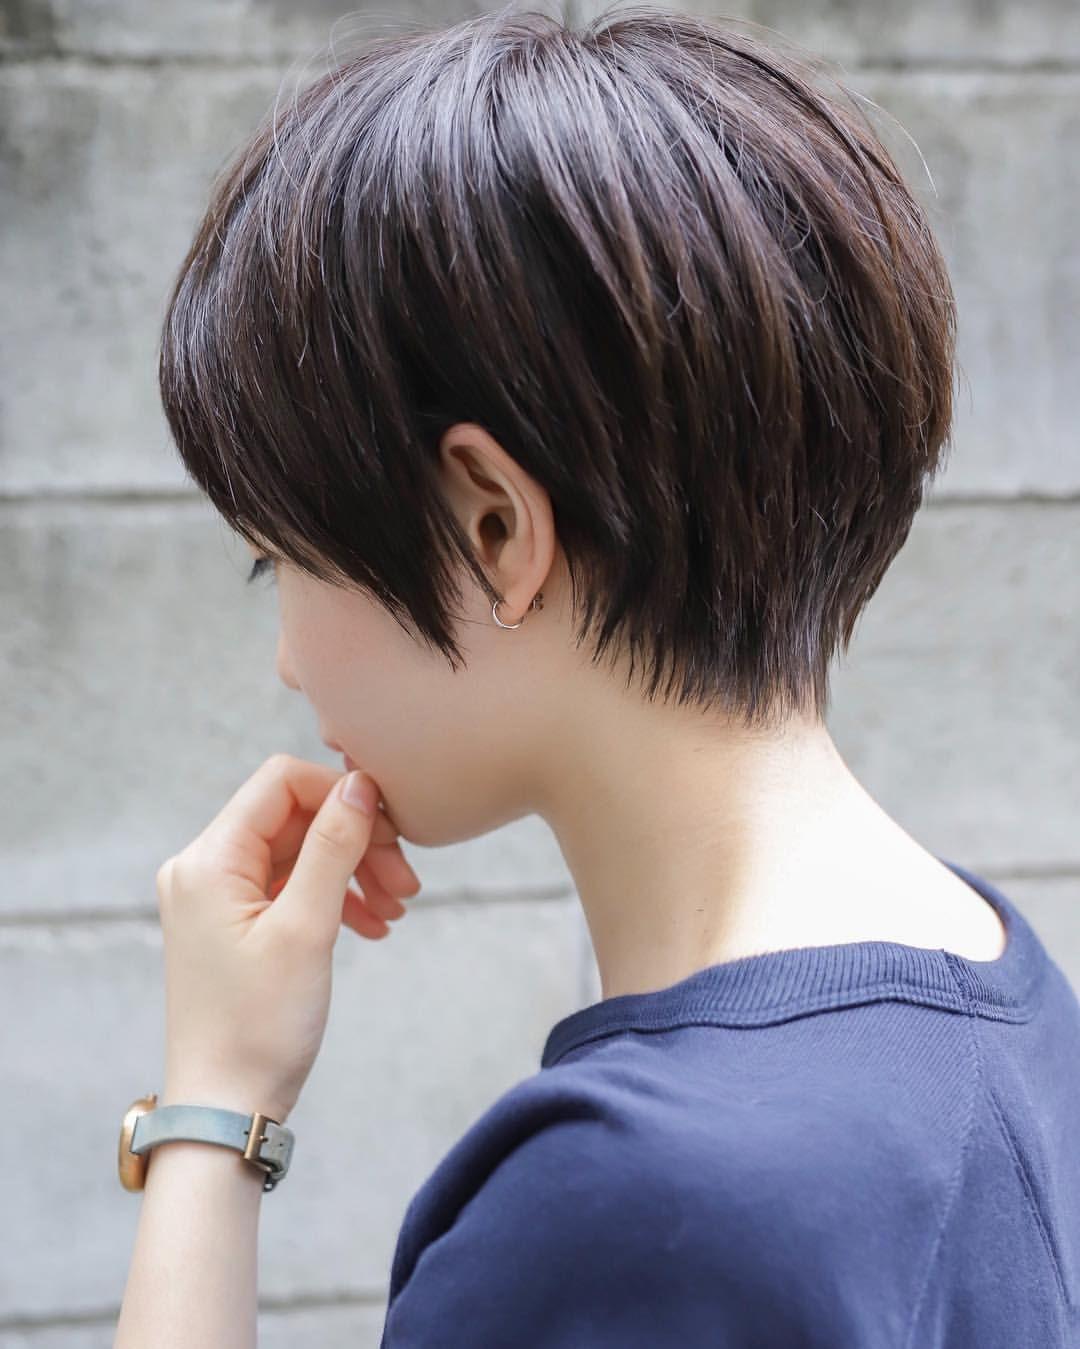 Ogaさんはinstagramを利用しています 秋風にうなじを晒して 髪を切ろう お客様カット